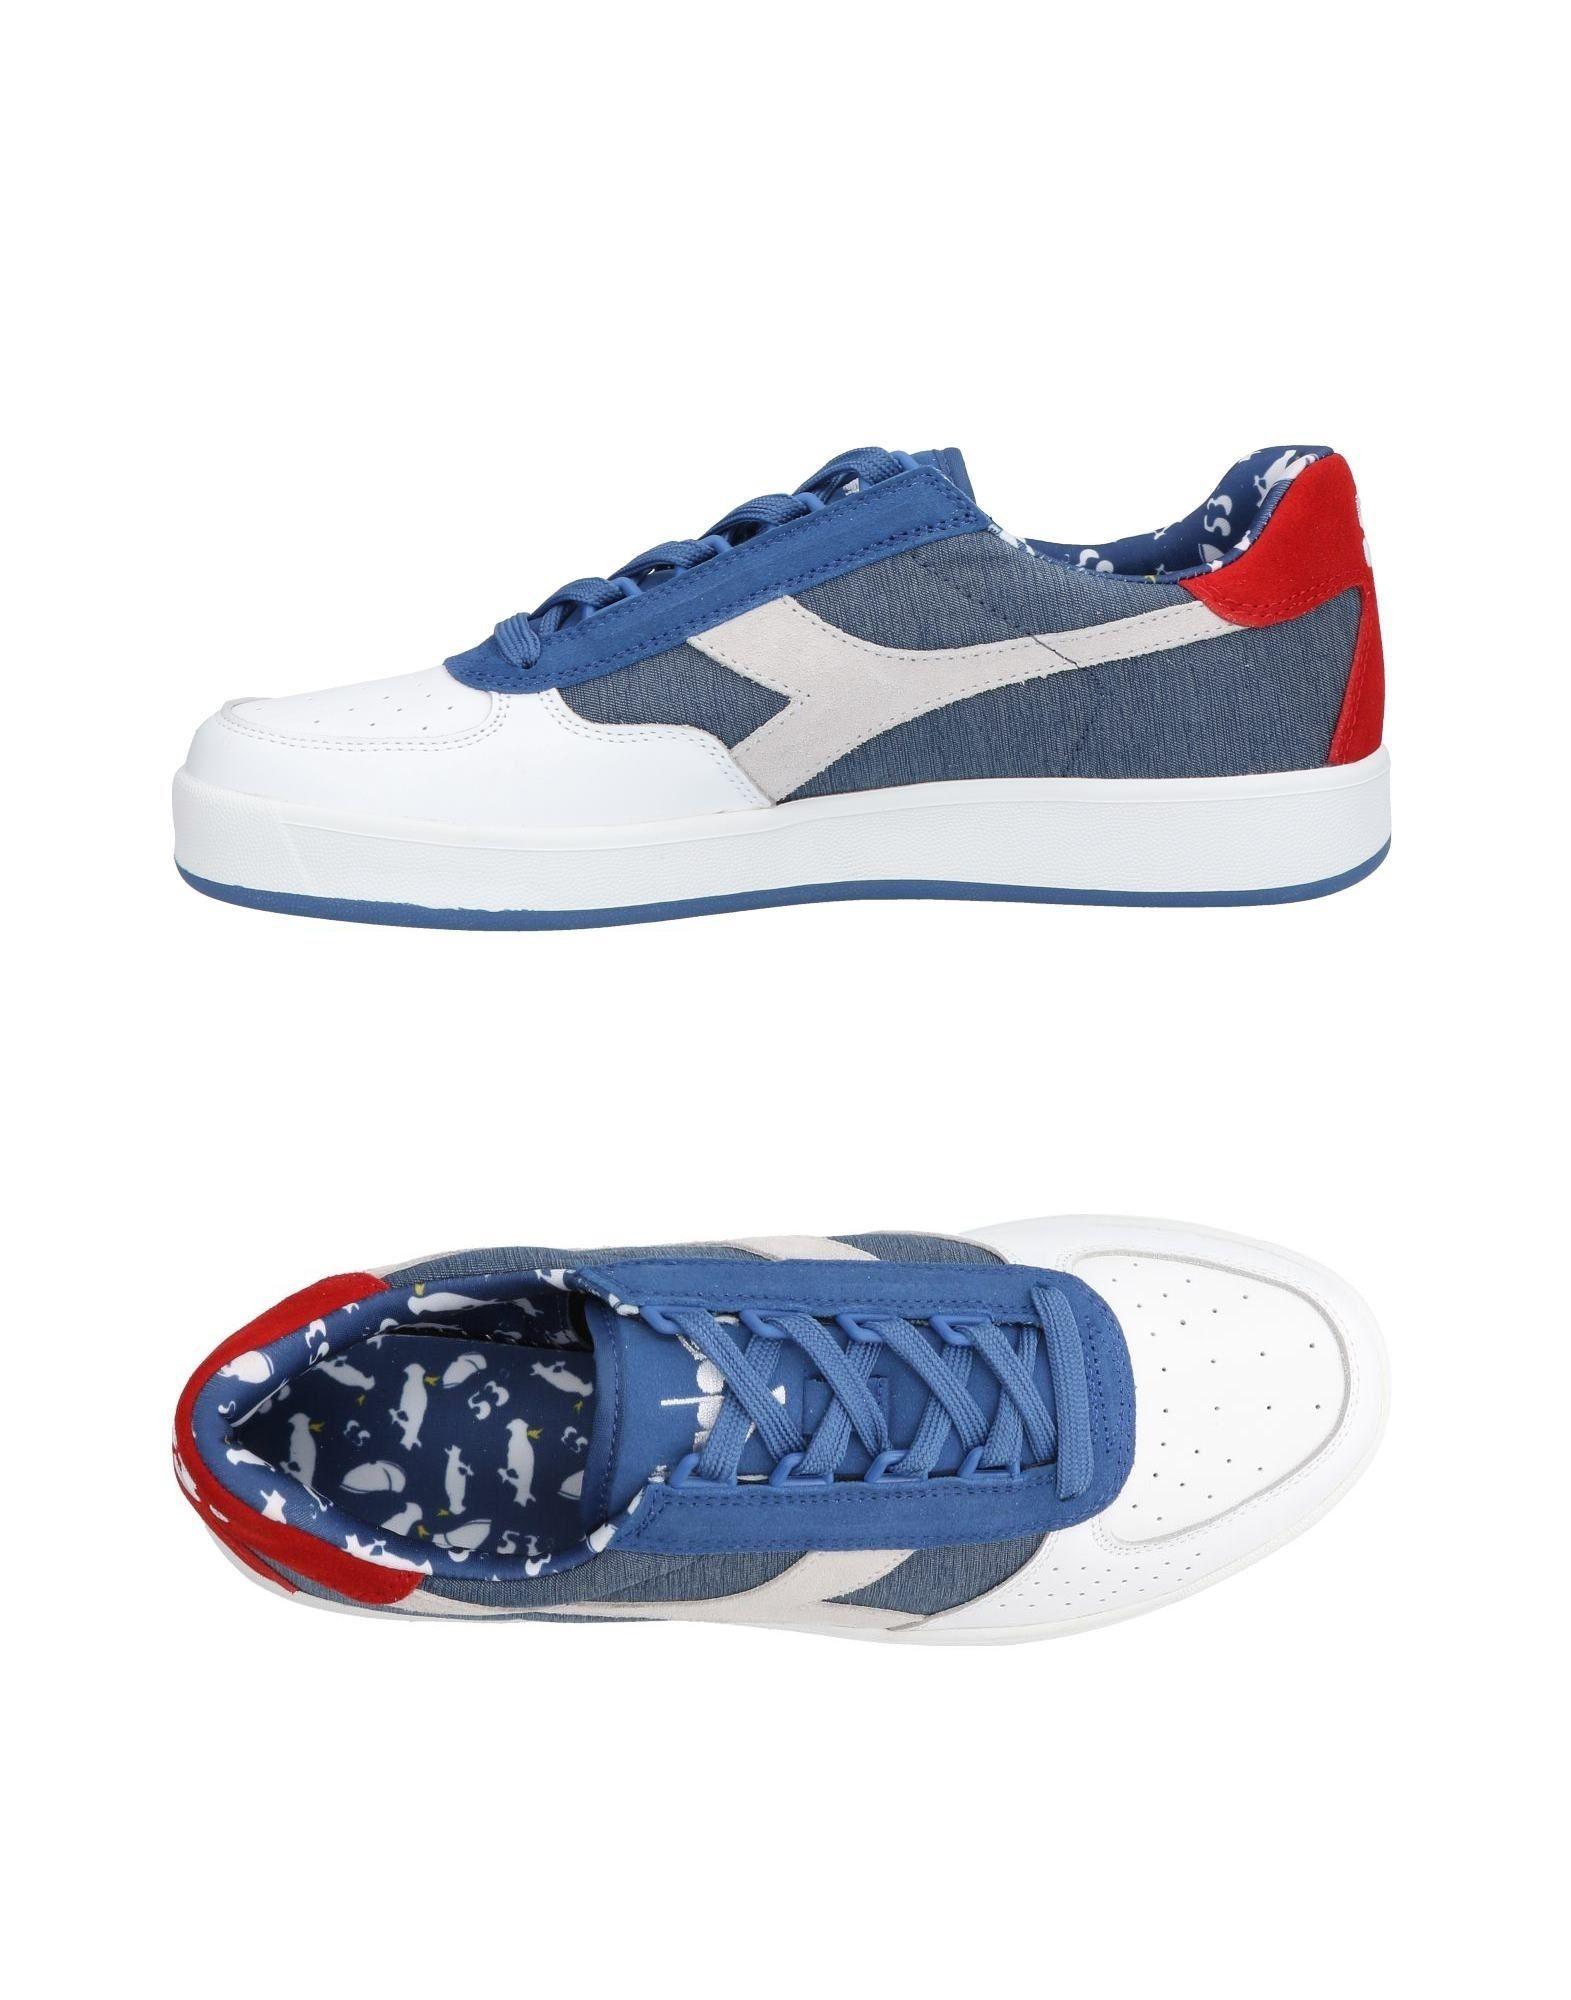 Chaussures Homme Dernières Baskets Diadora Blanc RvwxaO